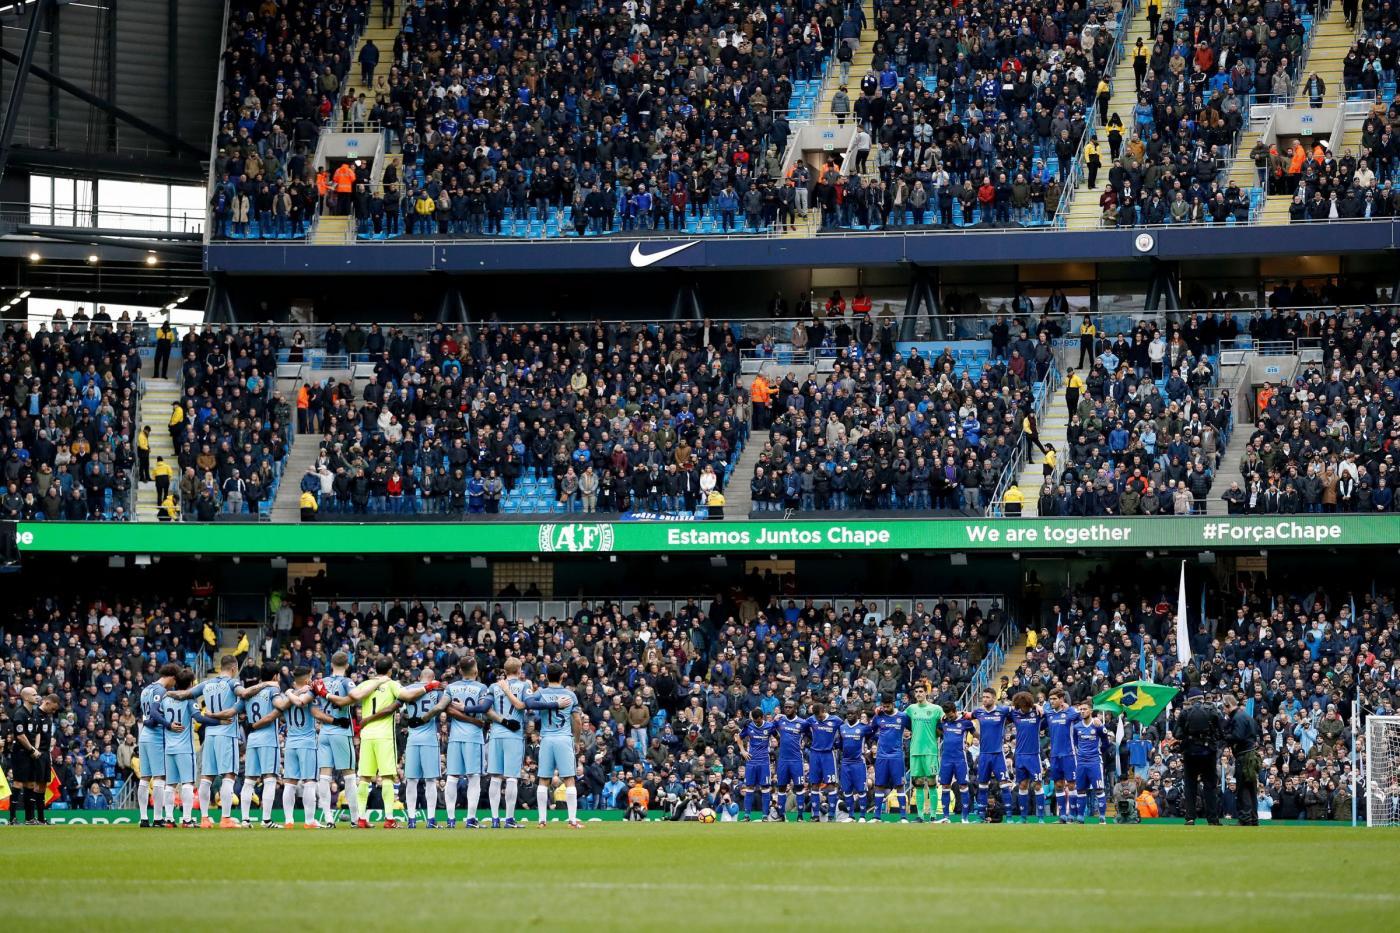 Calcio, Premier League: Conte abbatte Guardiola, Manchester City-Chelsea finisce 1-3